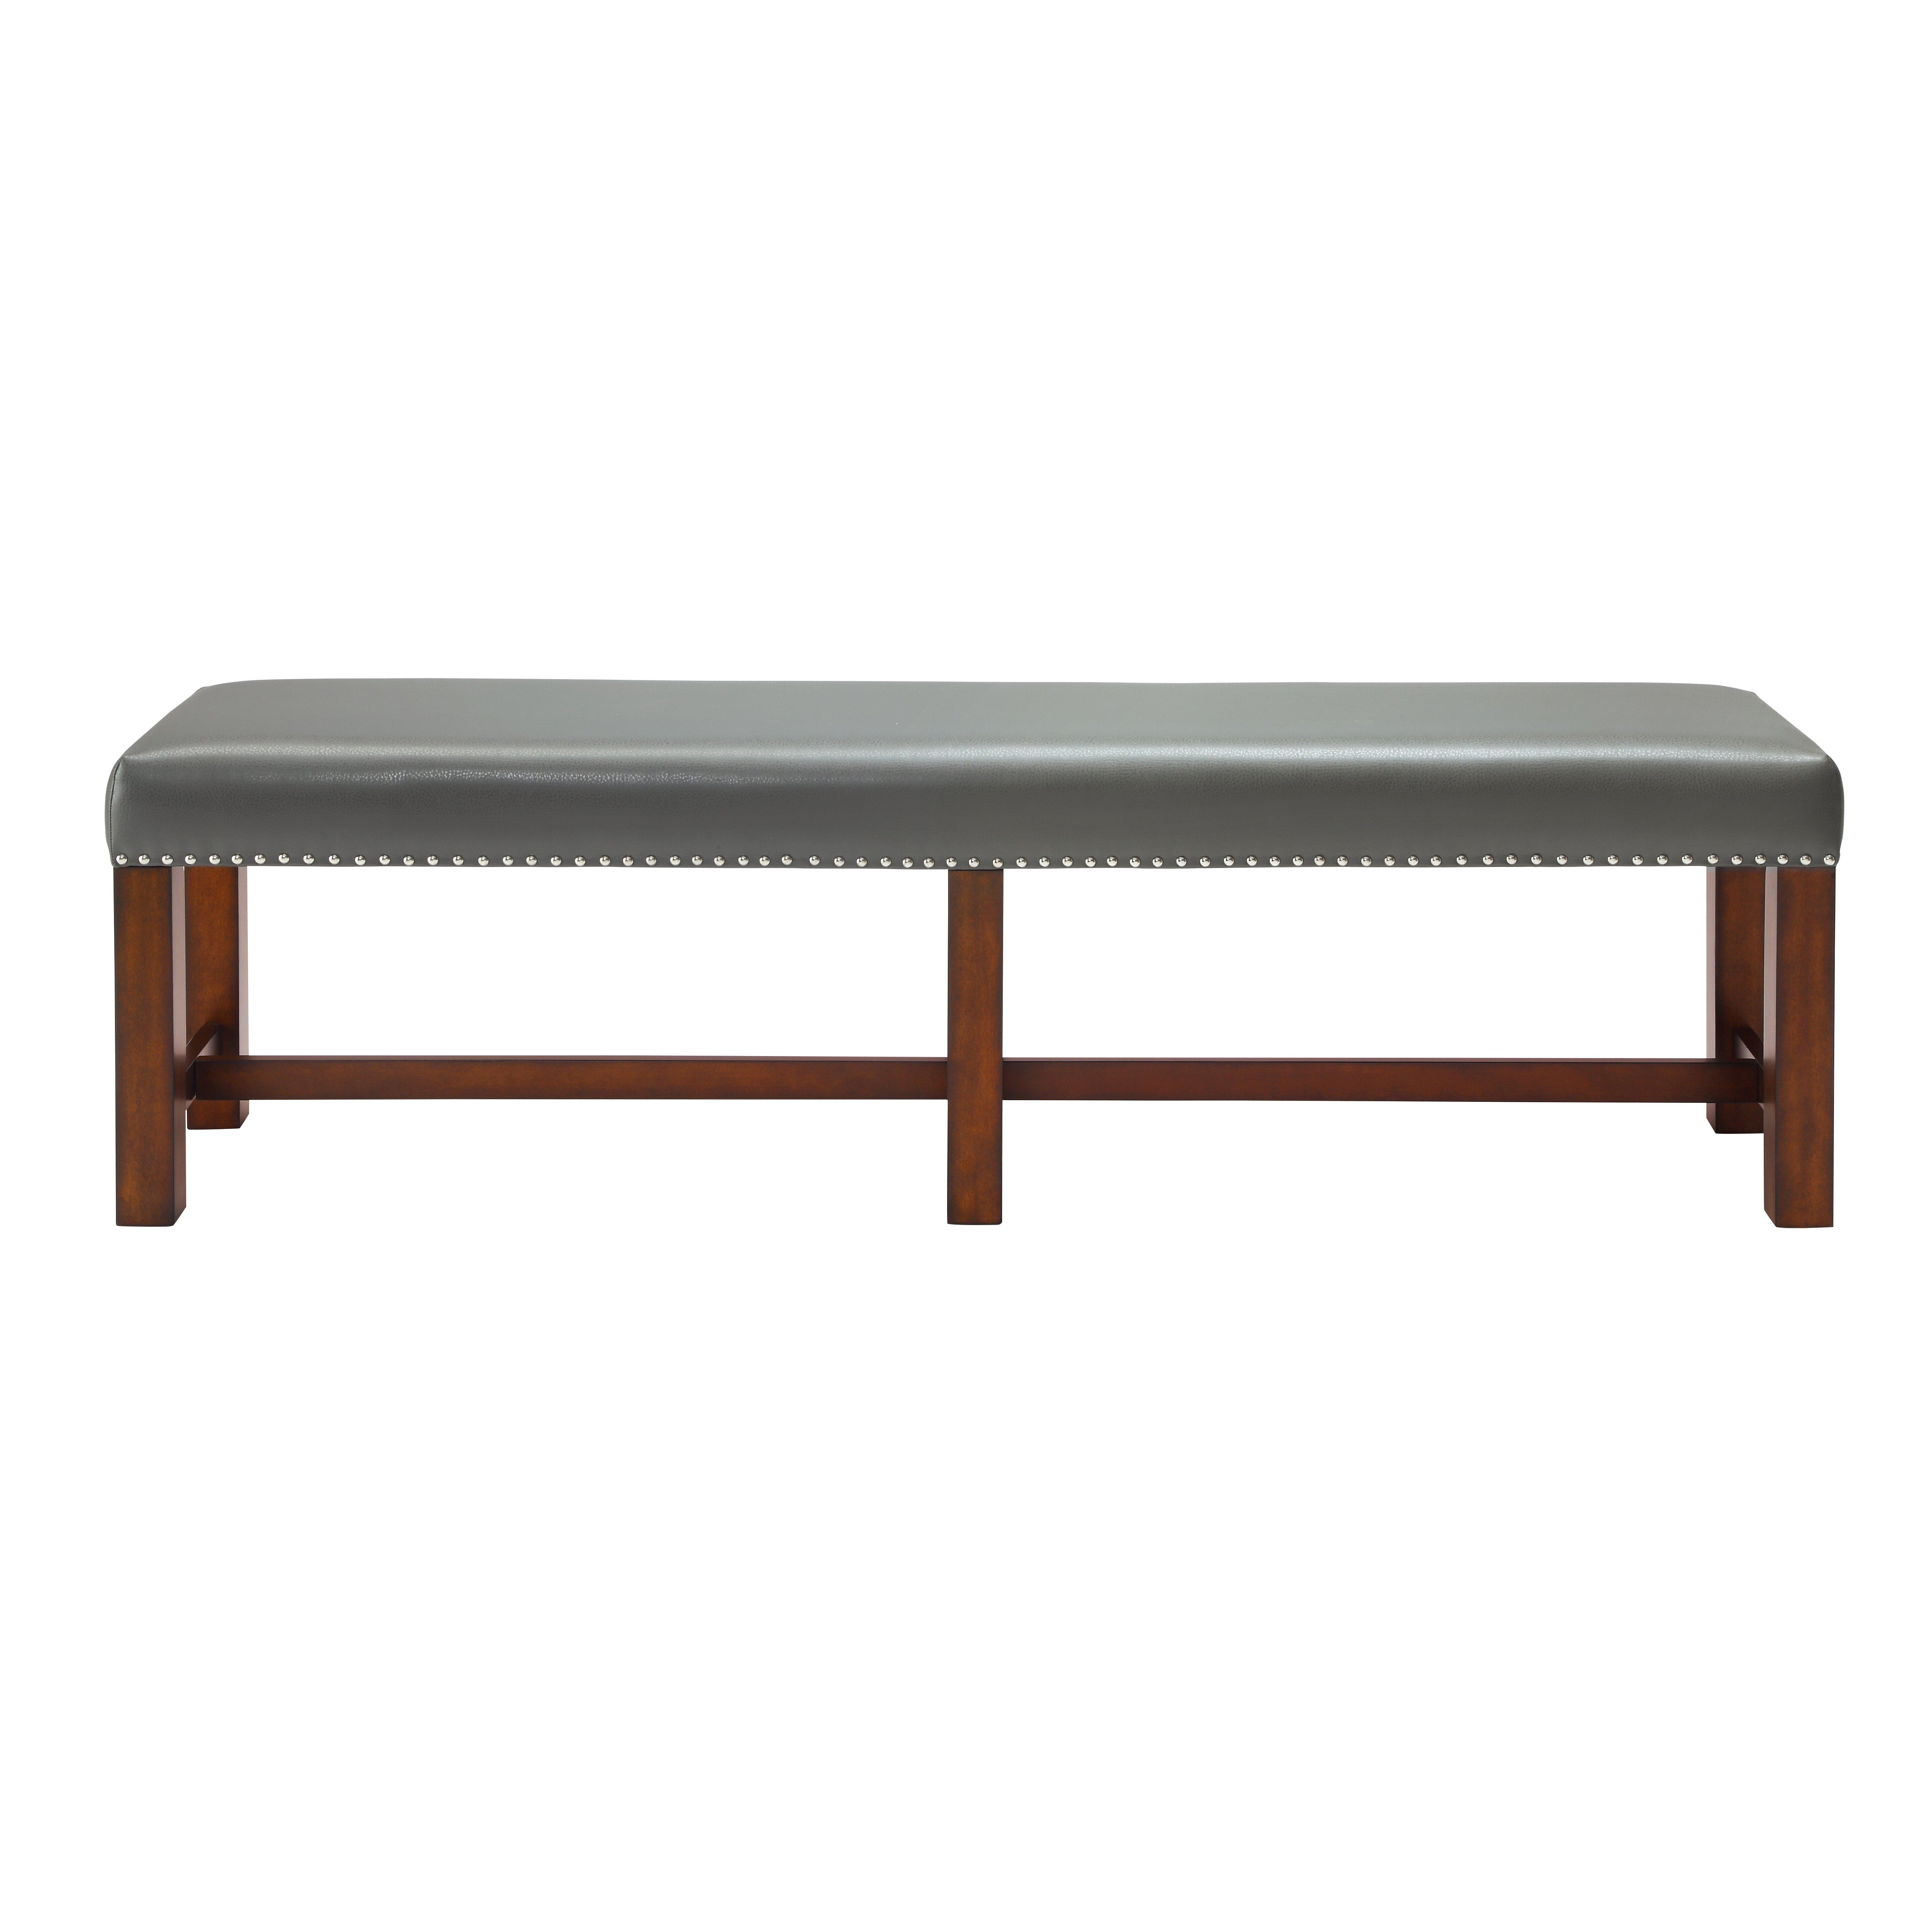 Foyer Leather Bench : Latitude run zaria leather entryway bench reviews wayfair